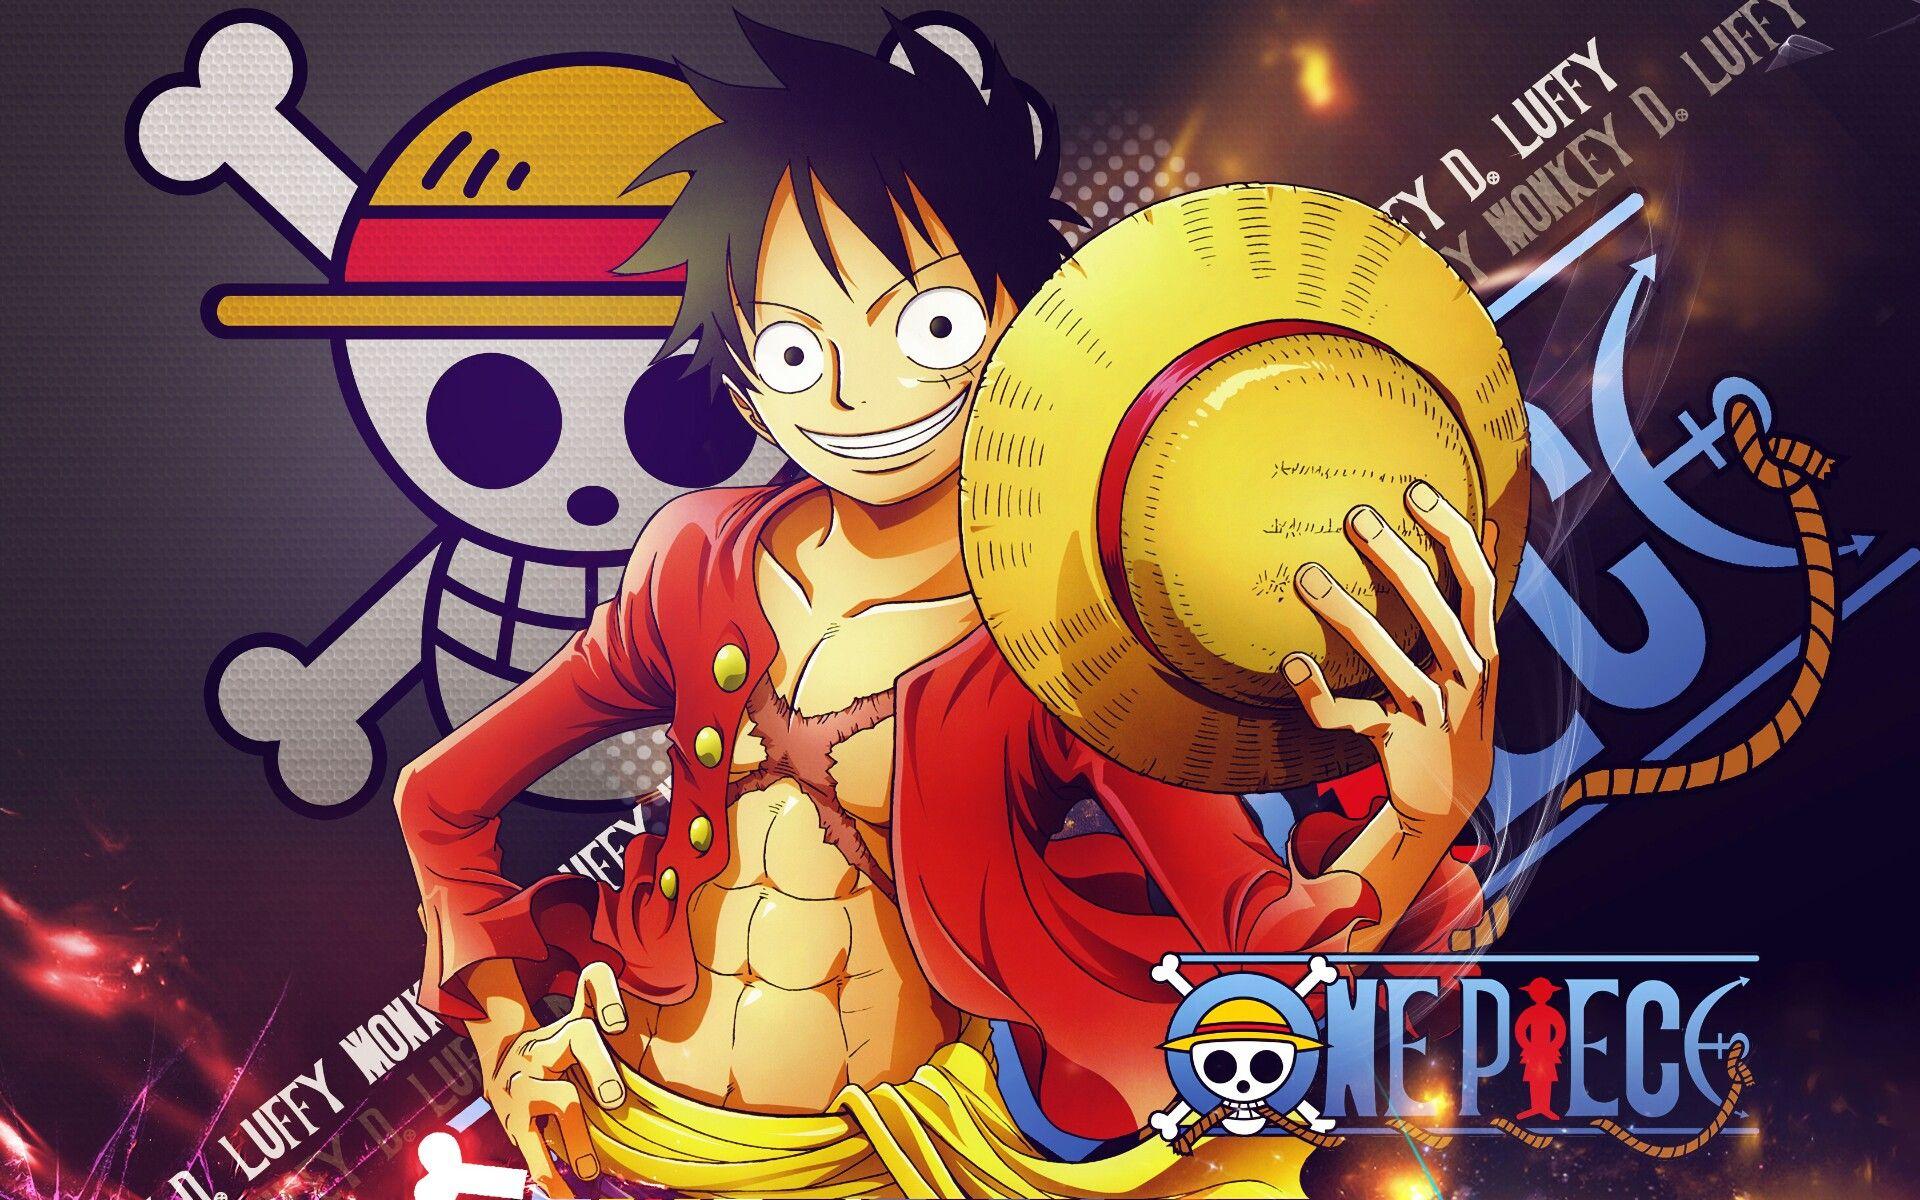 Onepiece Luffy One Piece Luffy Anime One Piece Cartoon